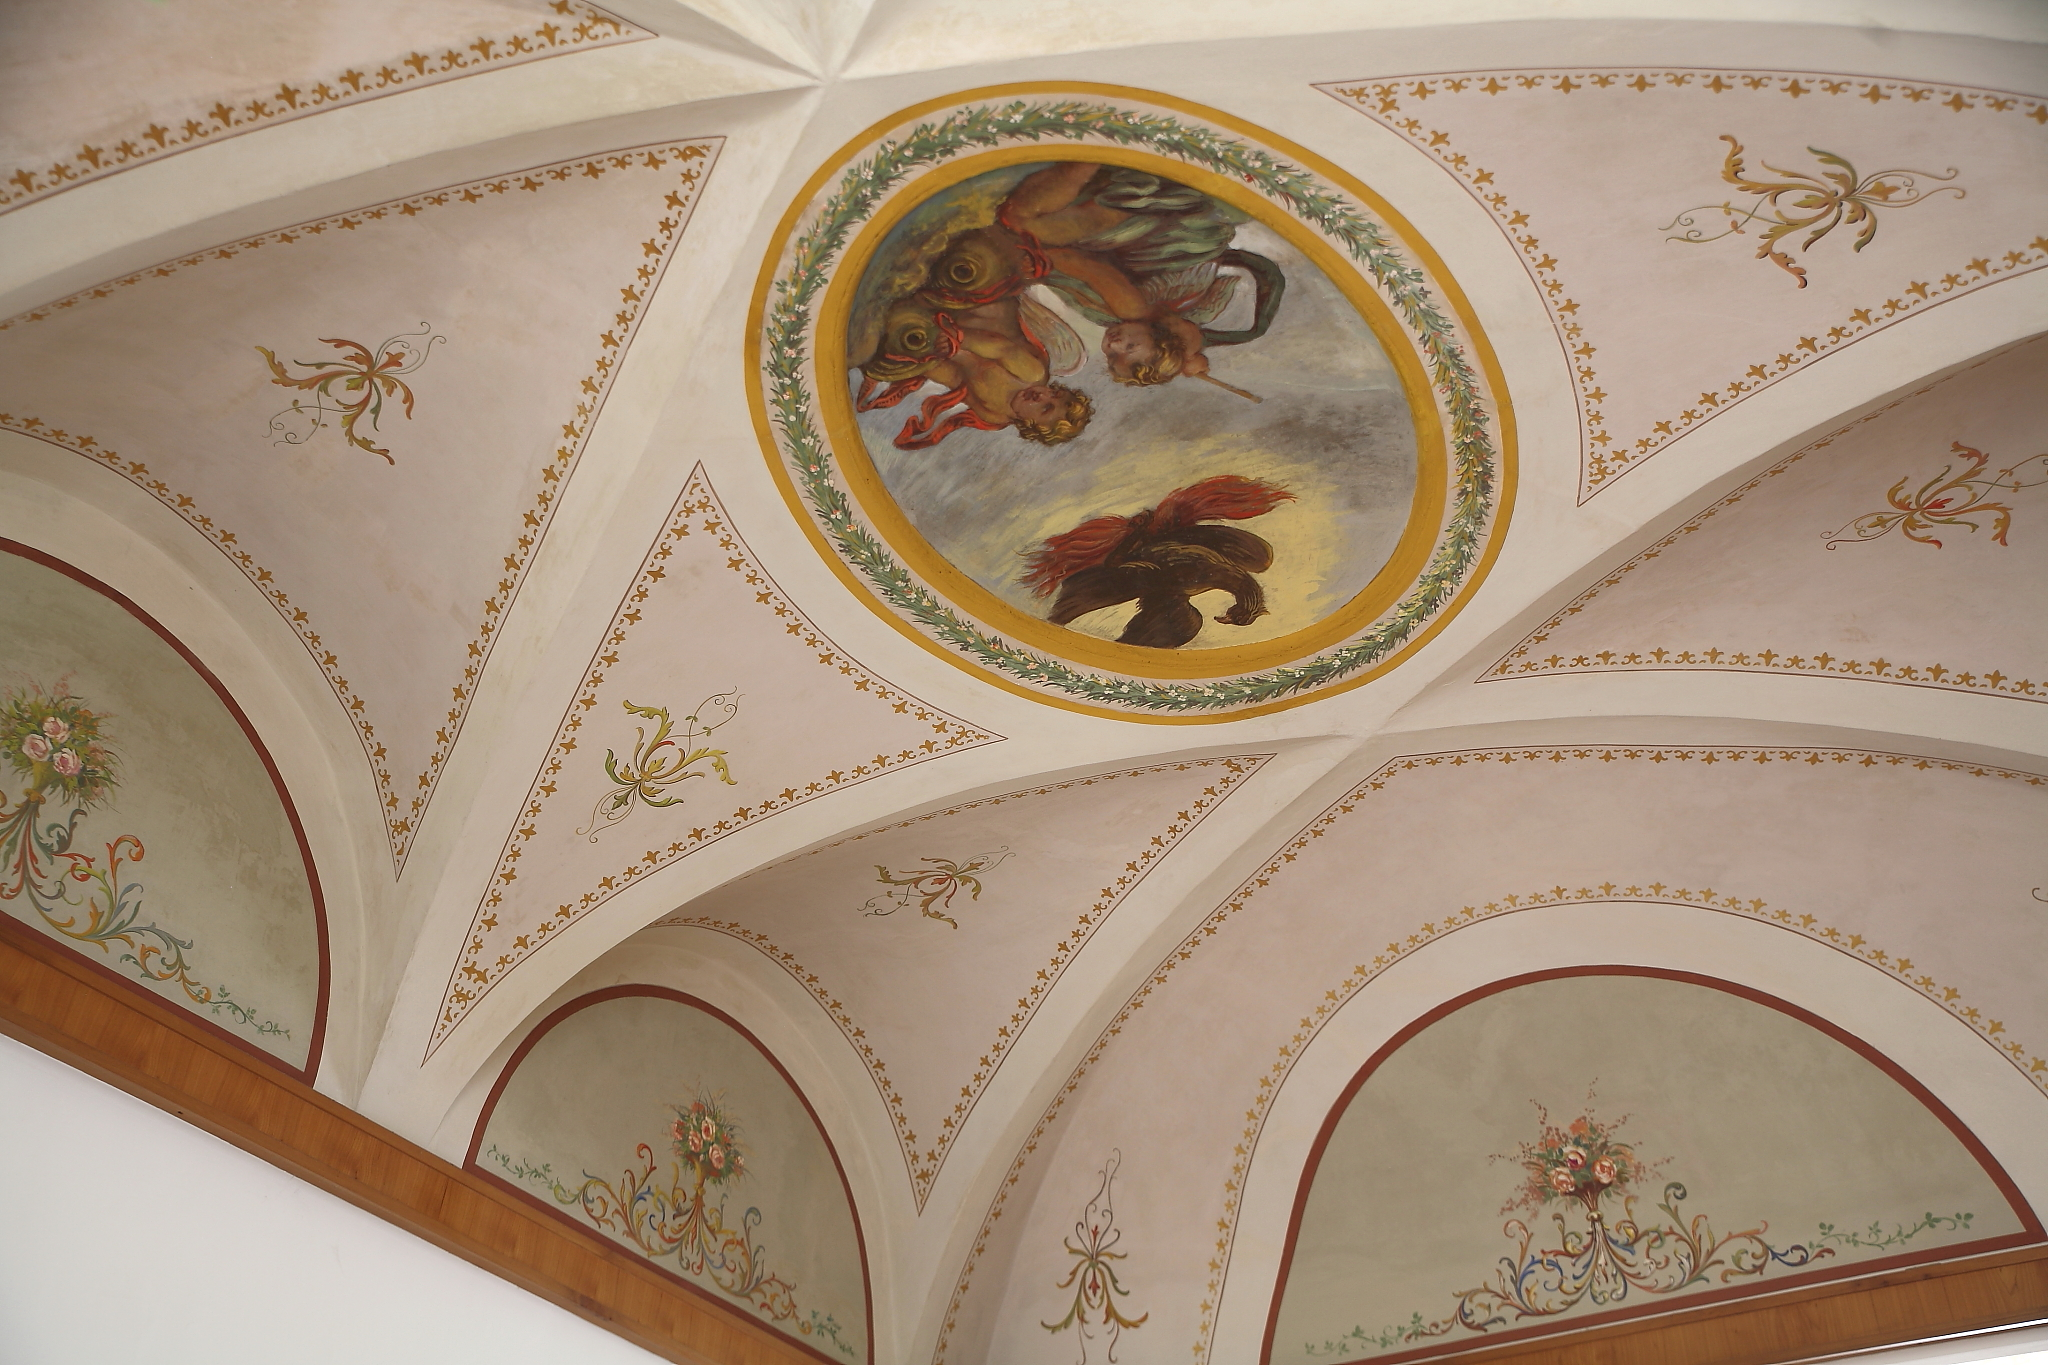 Mastro t restauro falegnameria design - Soffitti decorati ...